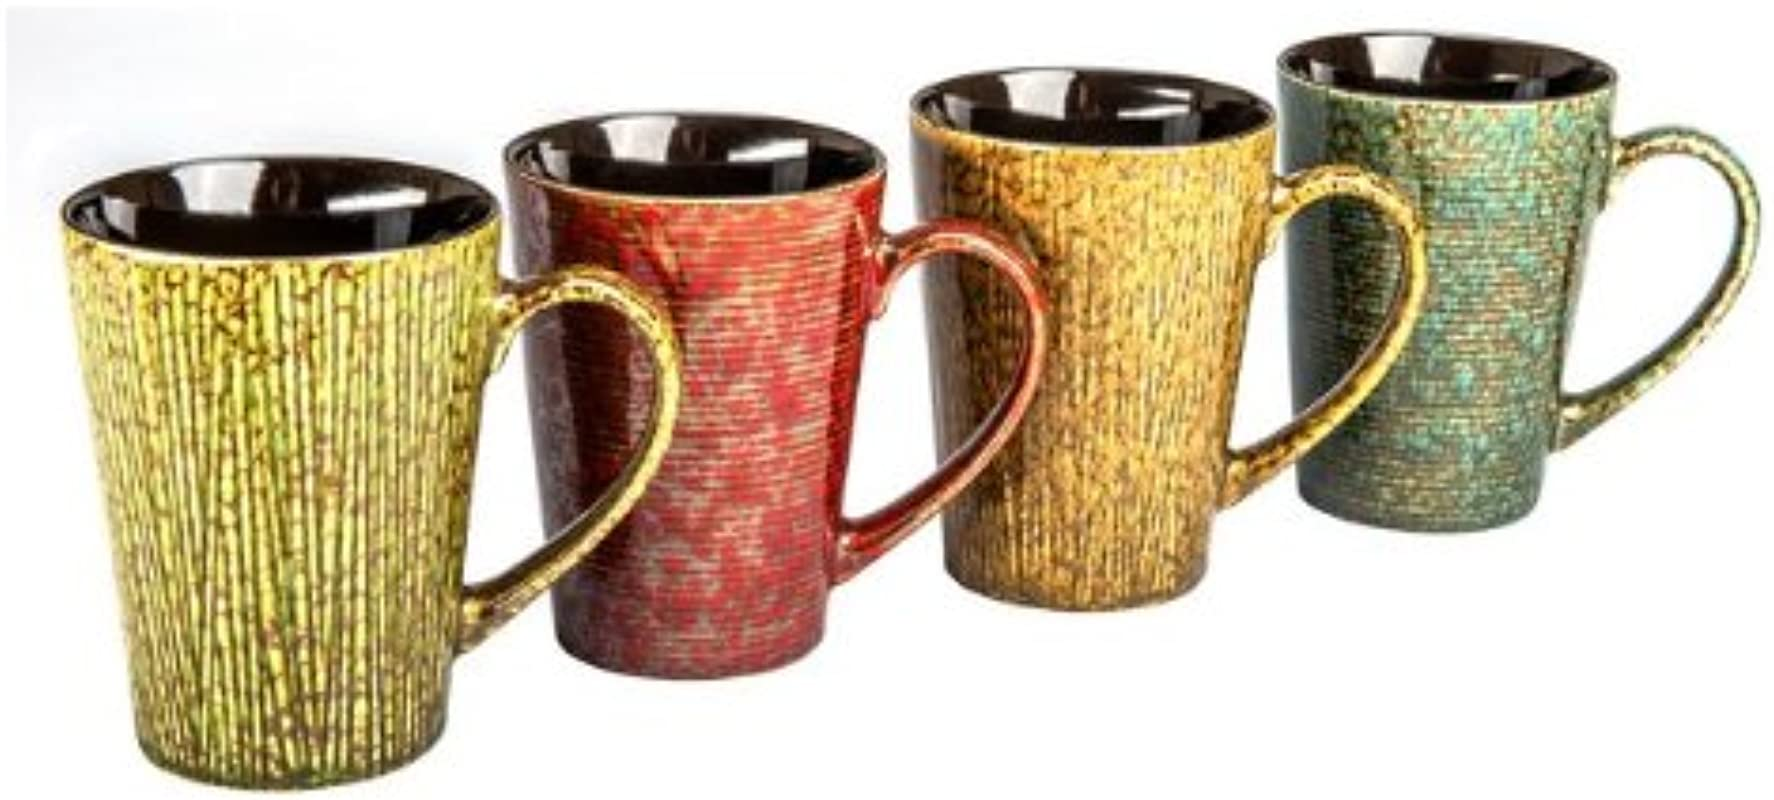 Bia Cordon Bleu Inc 403206 3026 17 Oz Mug Assorted Colors